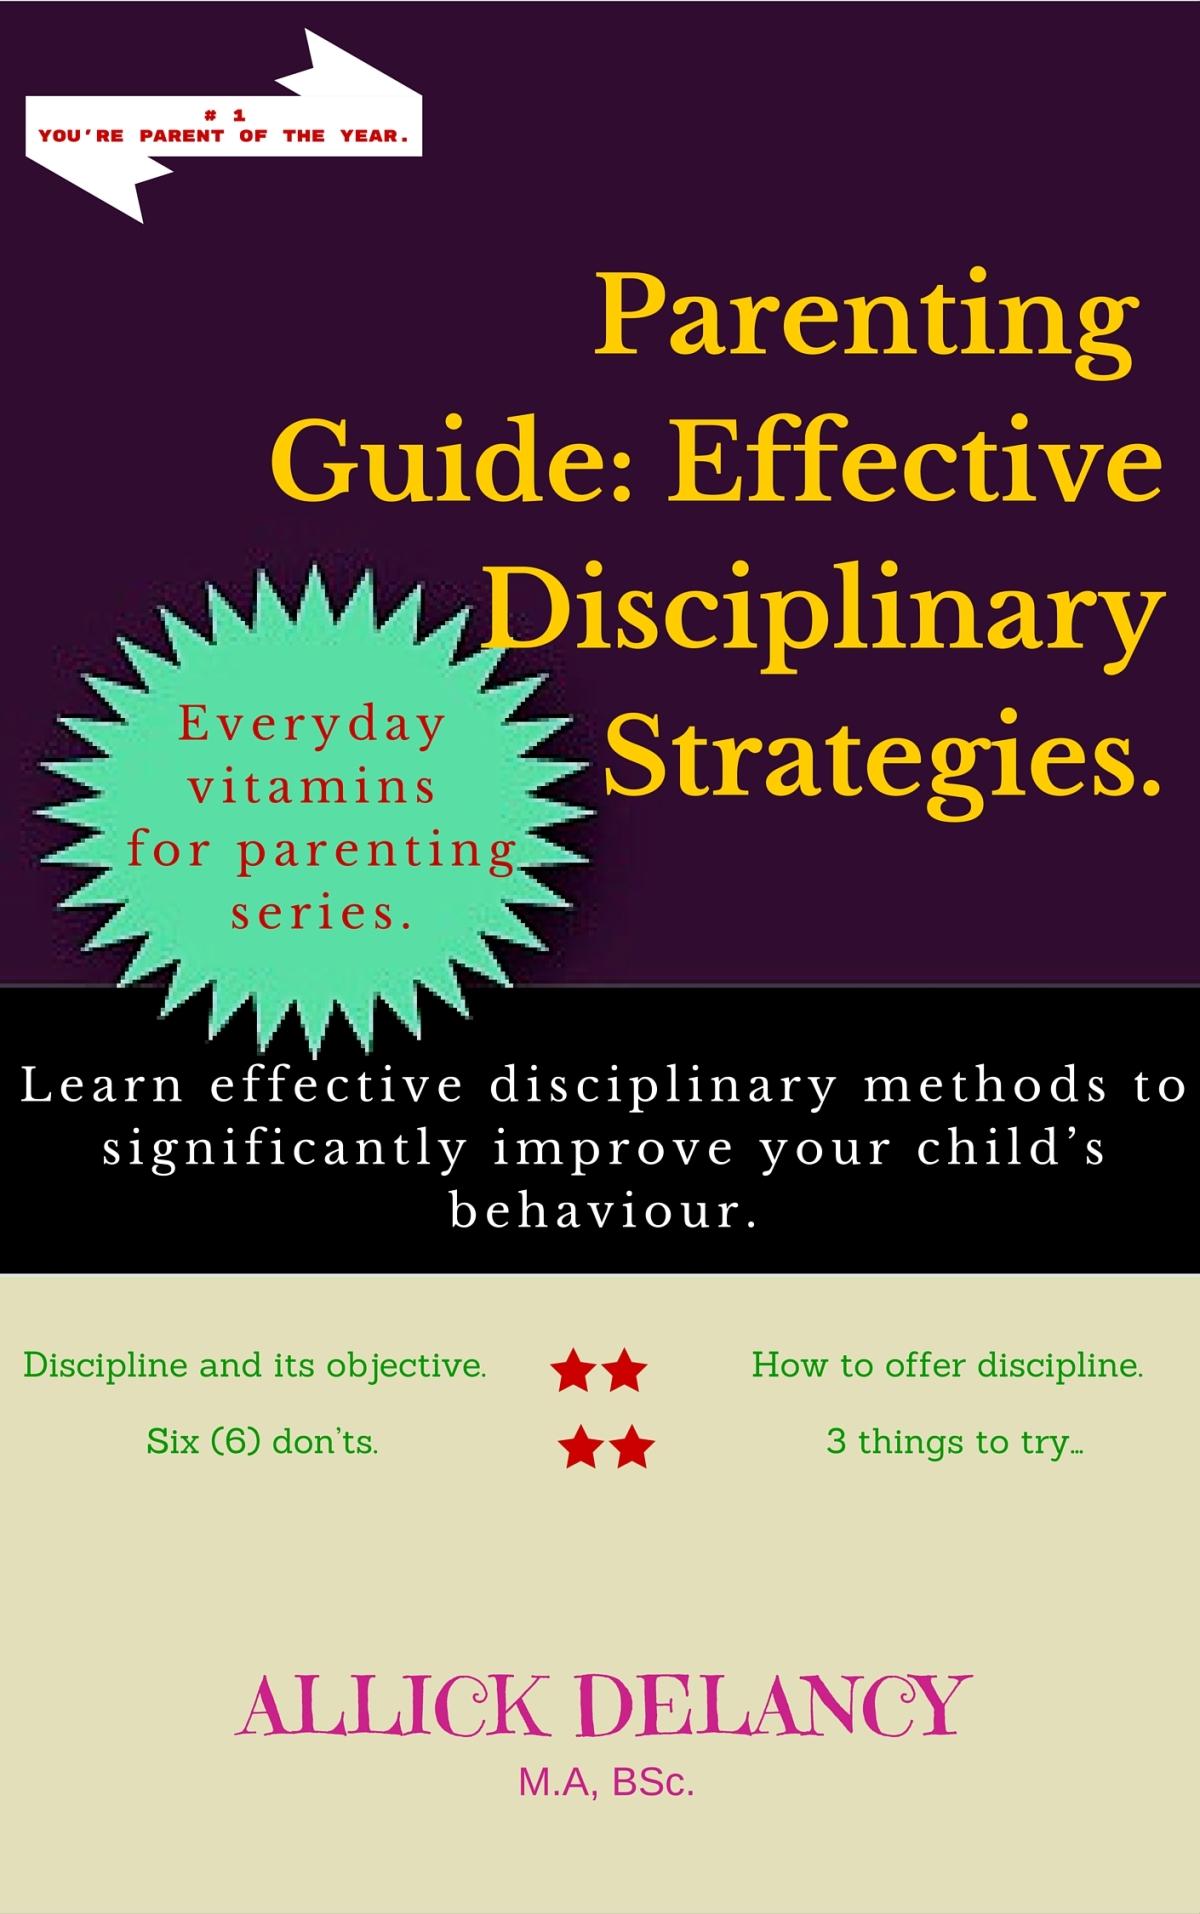 Parenting Guide: Effective DisciplinaryStrategies.